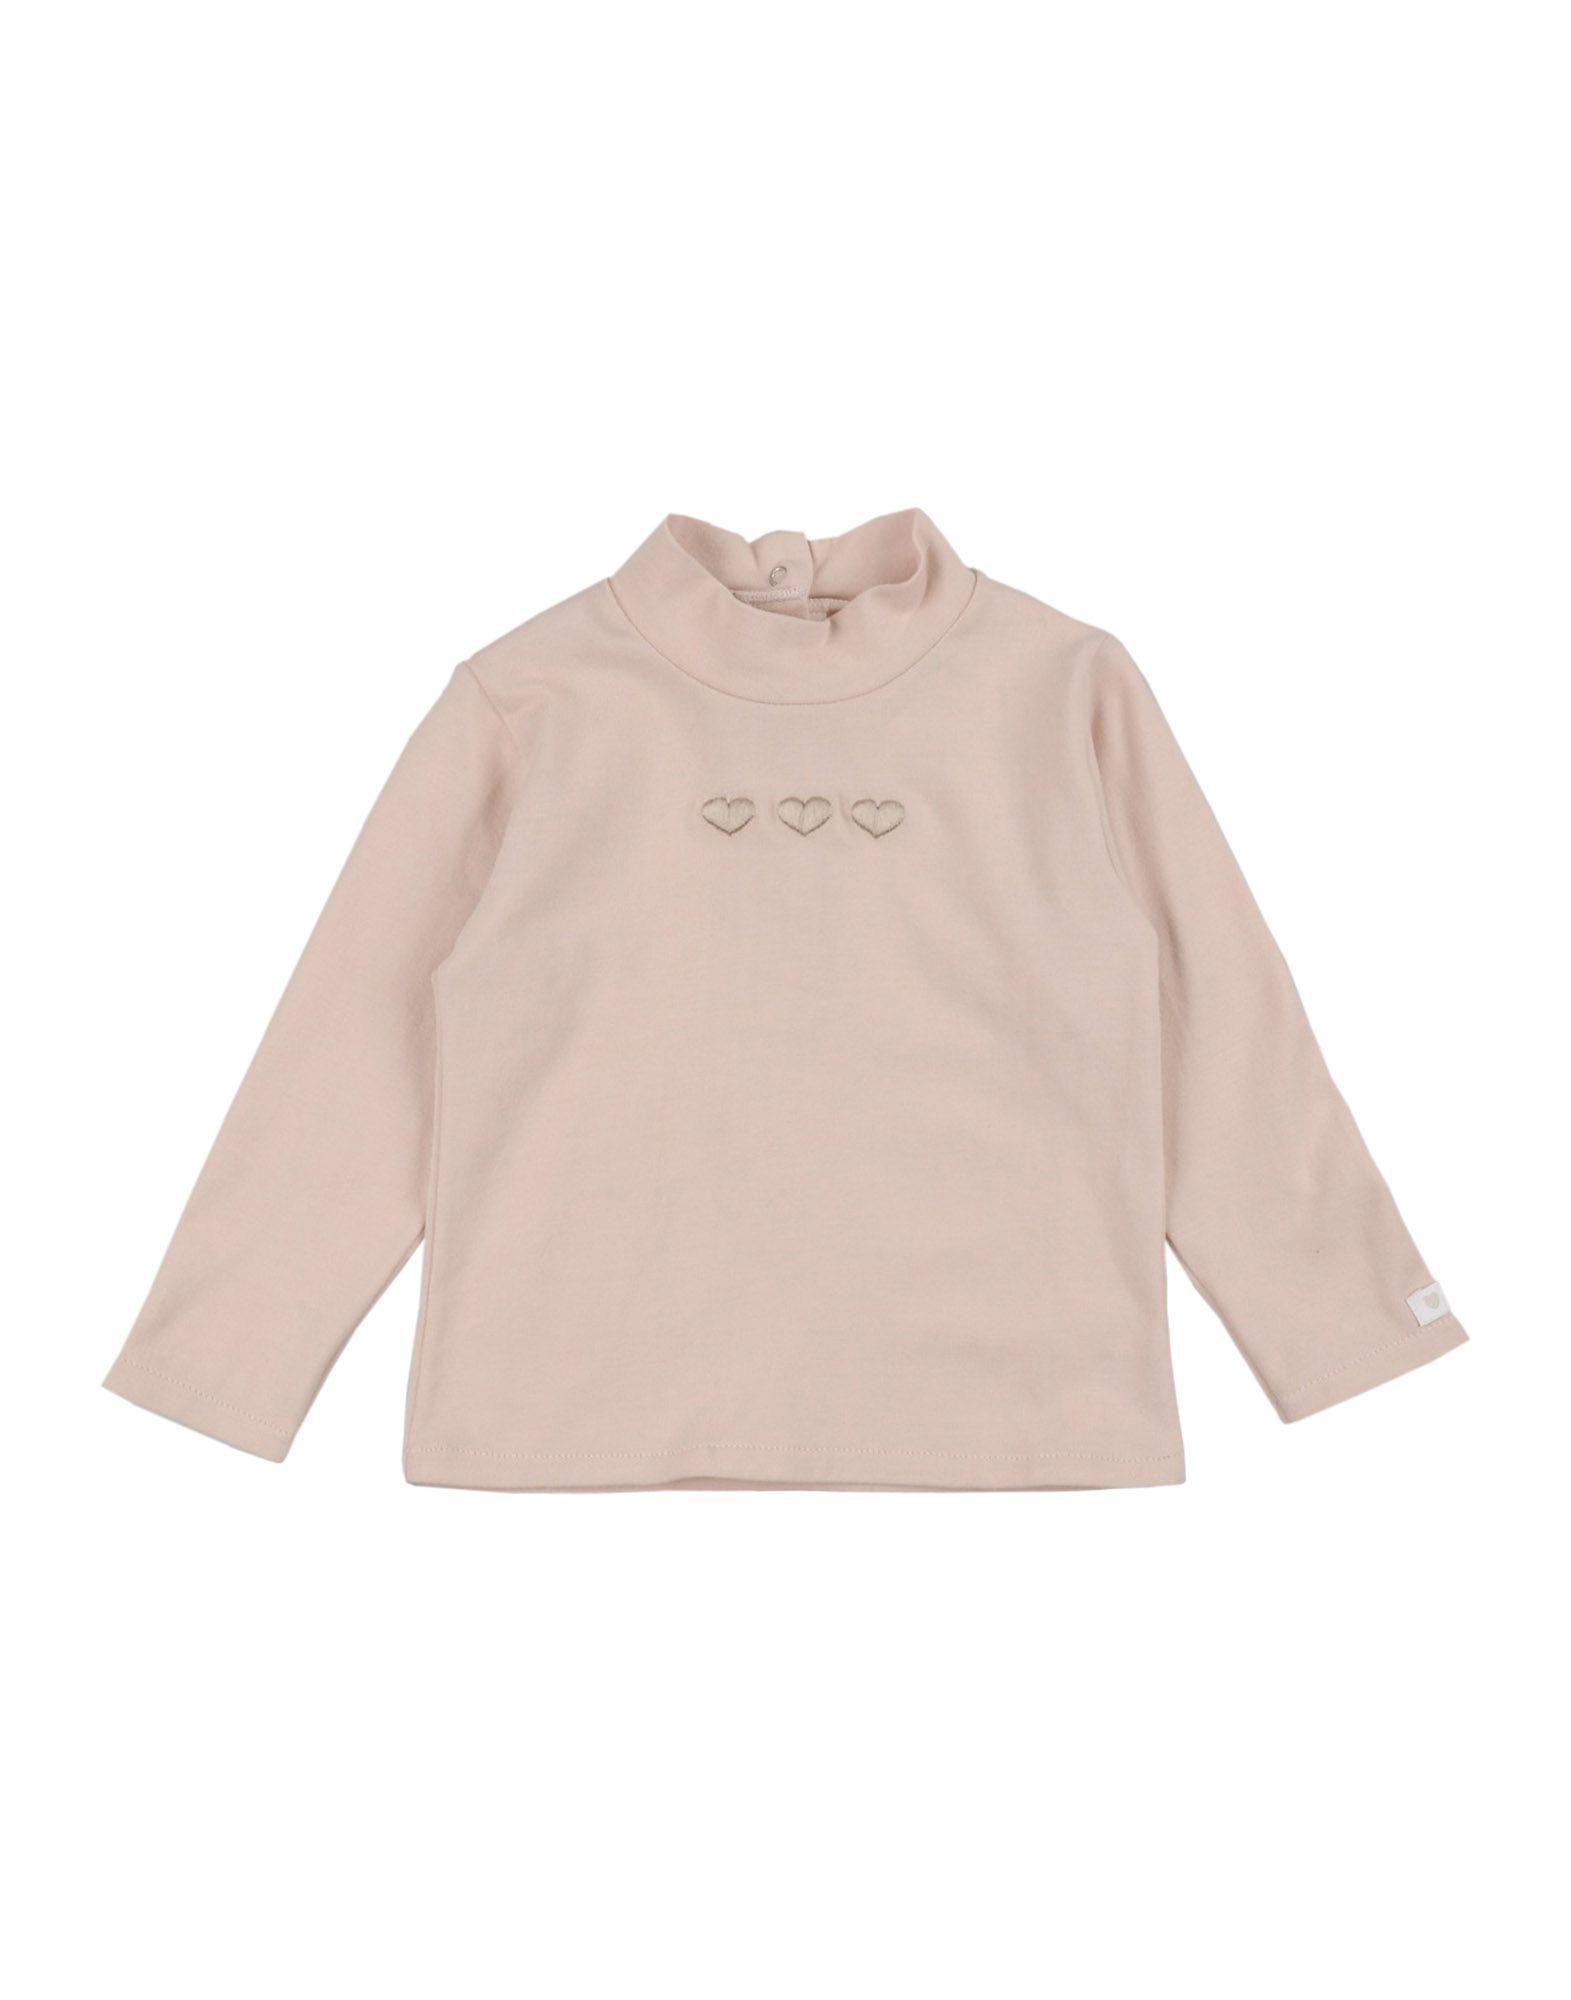 NANÁN Mädchen 0-24 monate T-shirts Farbe Nude Größe 4